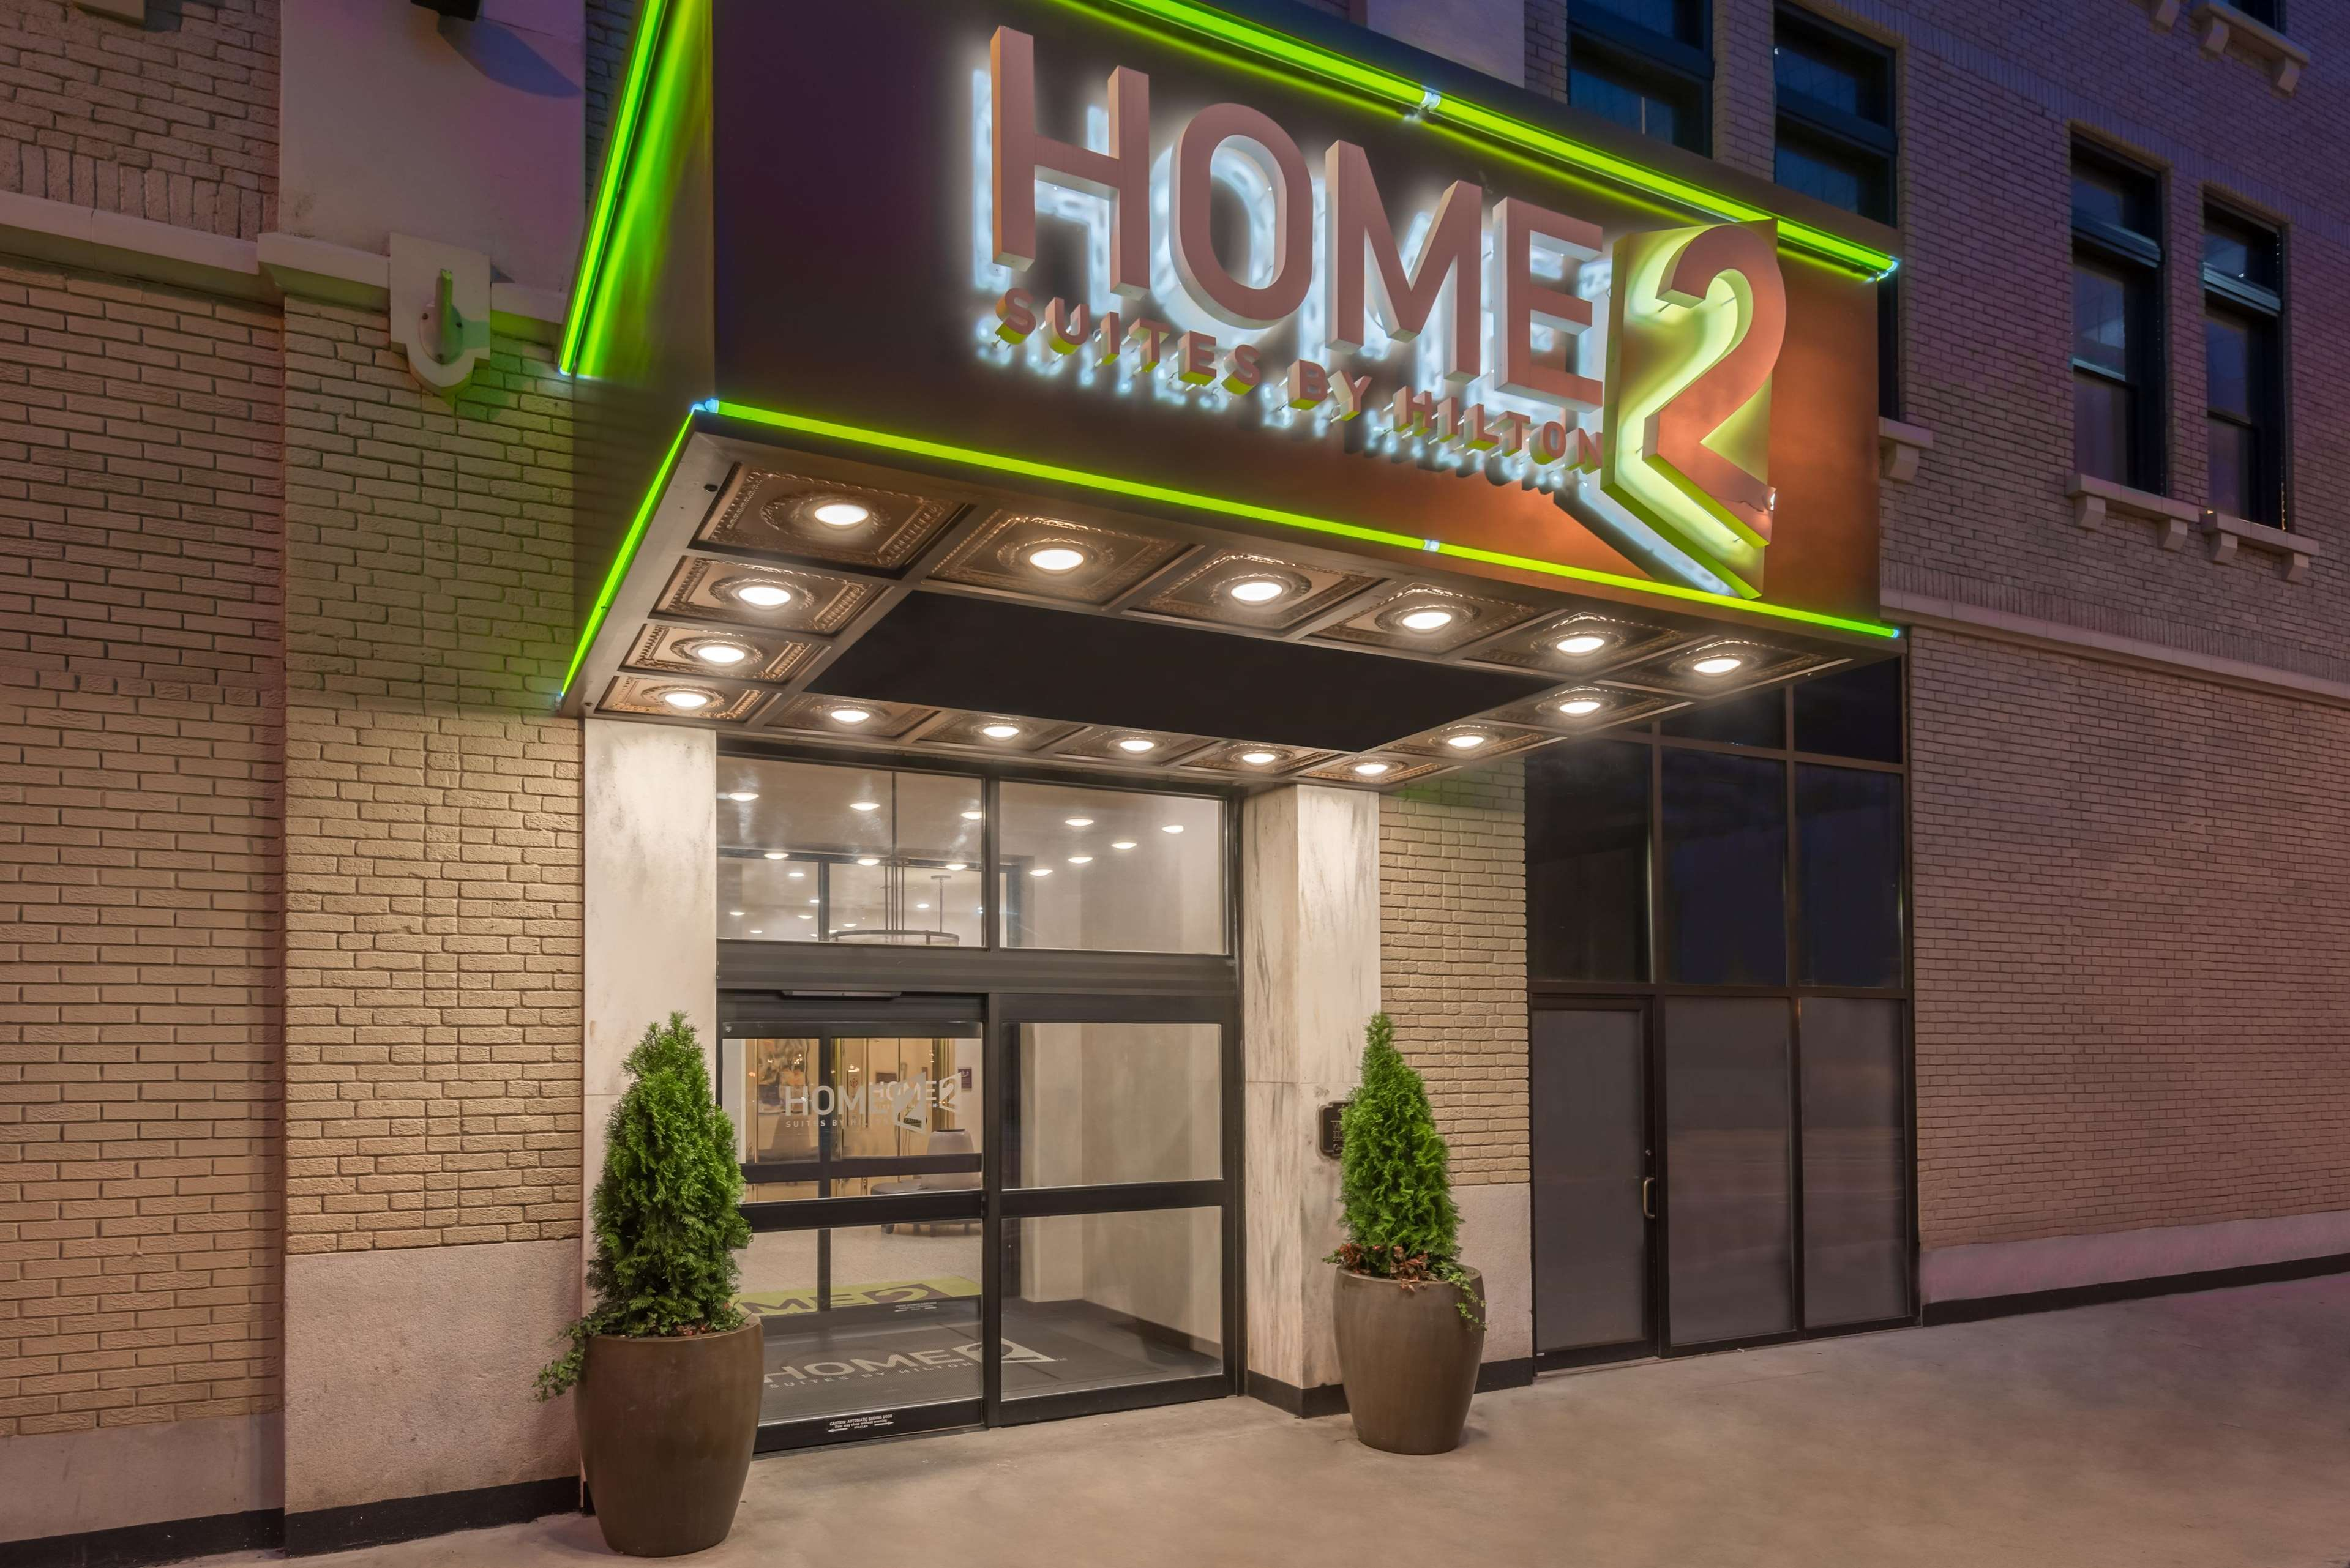 Home2 Suites by Hilton Atlanta Downtown image 30